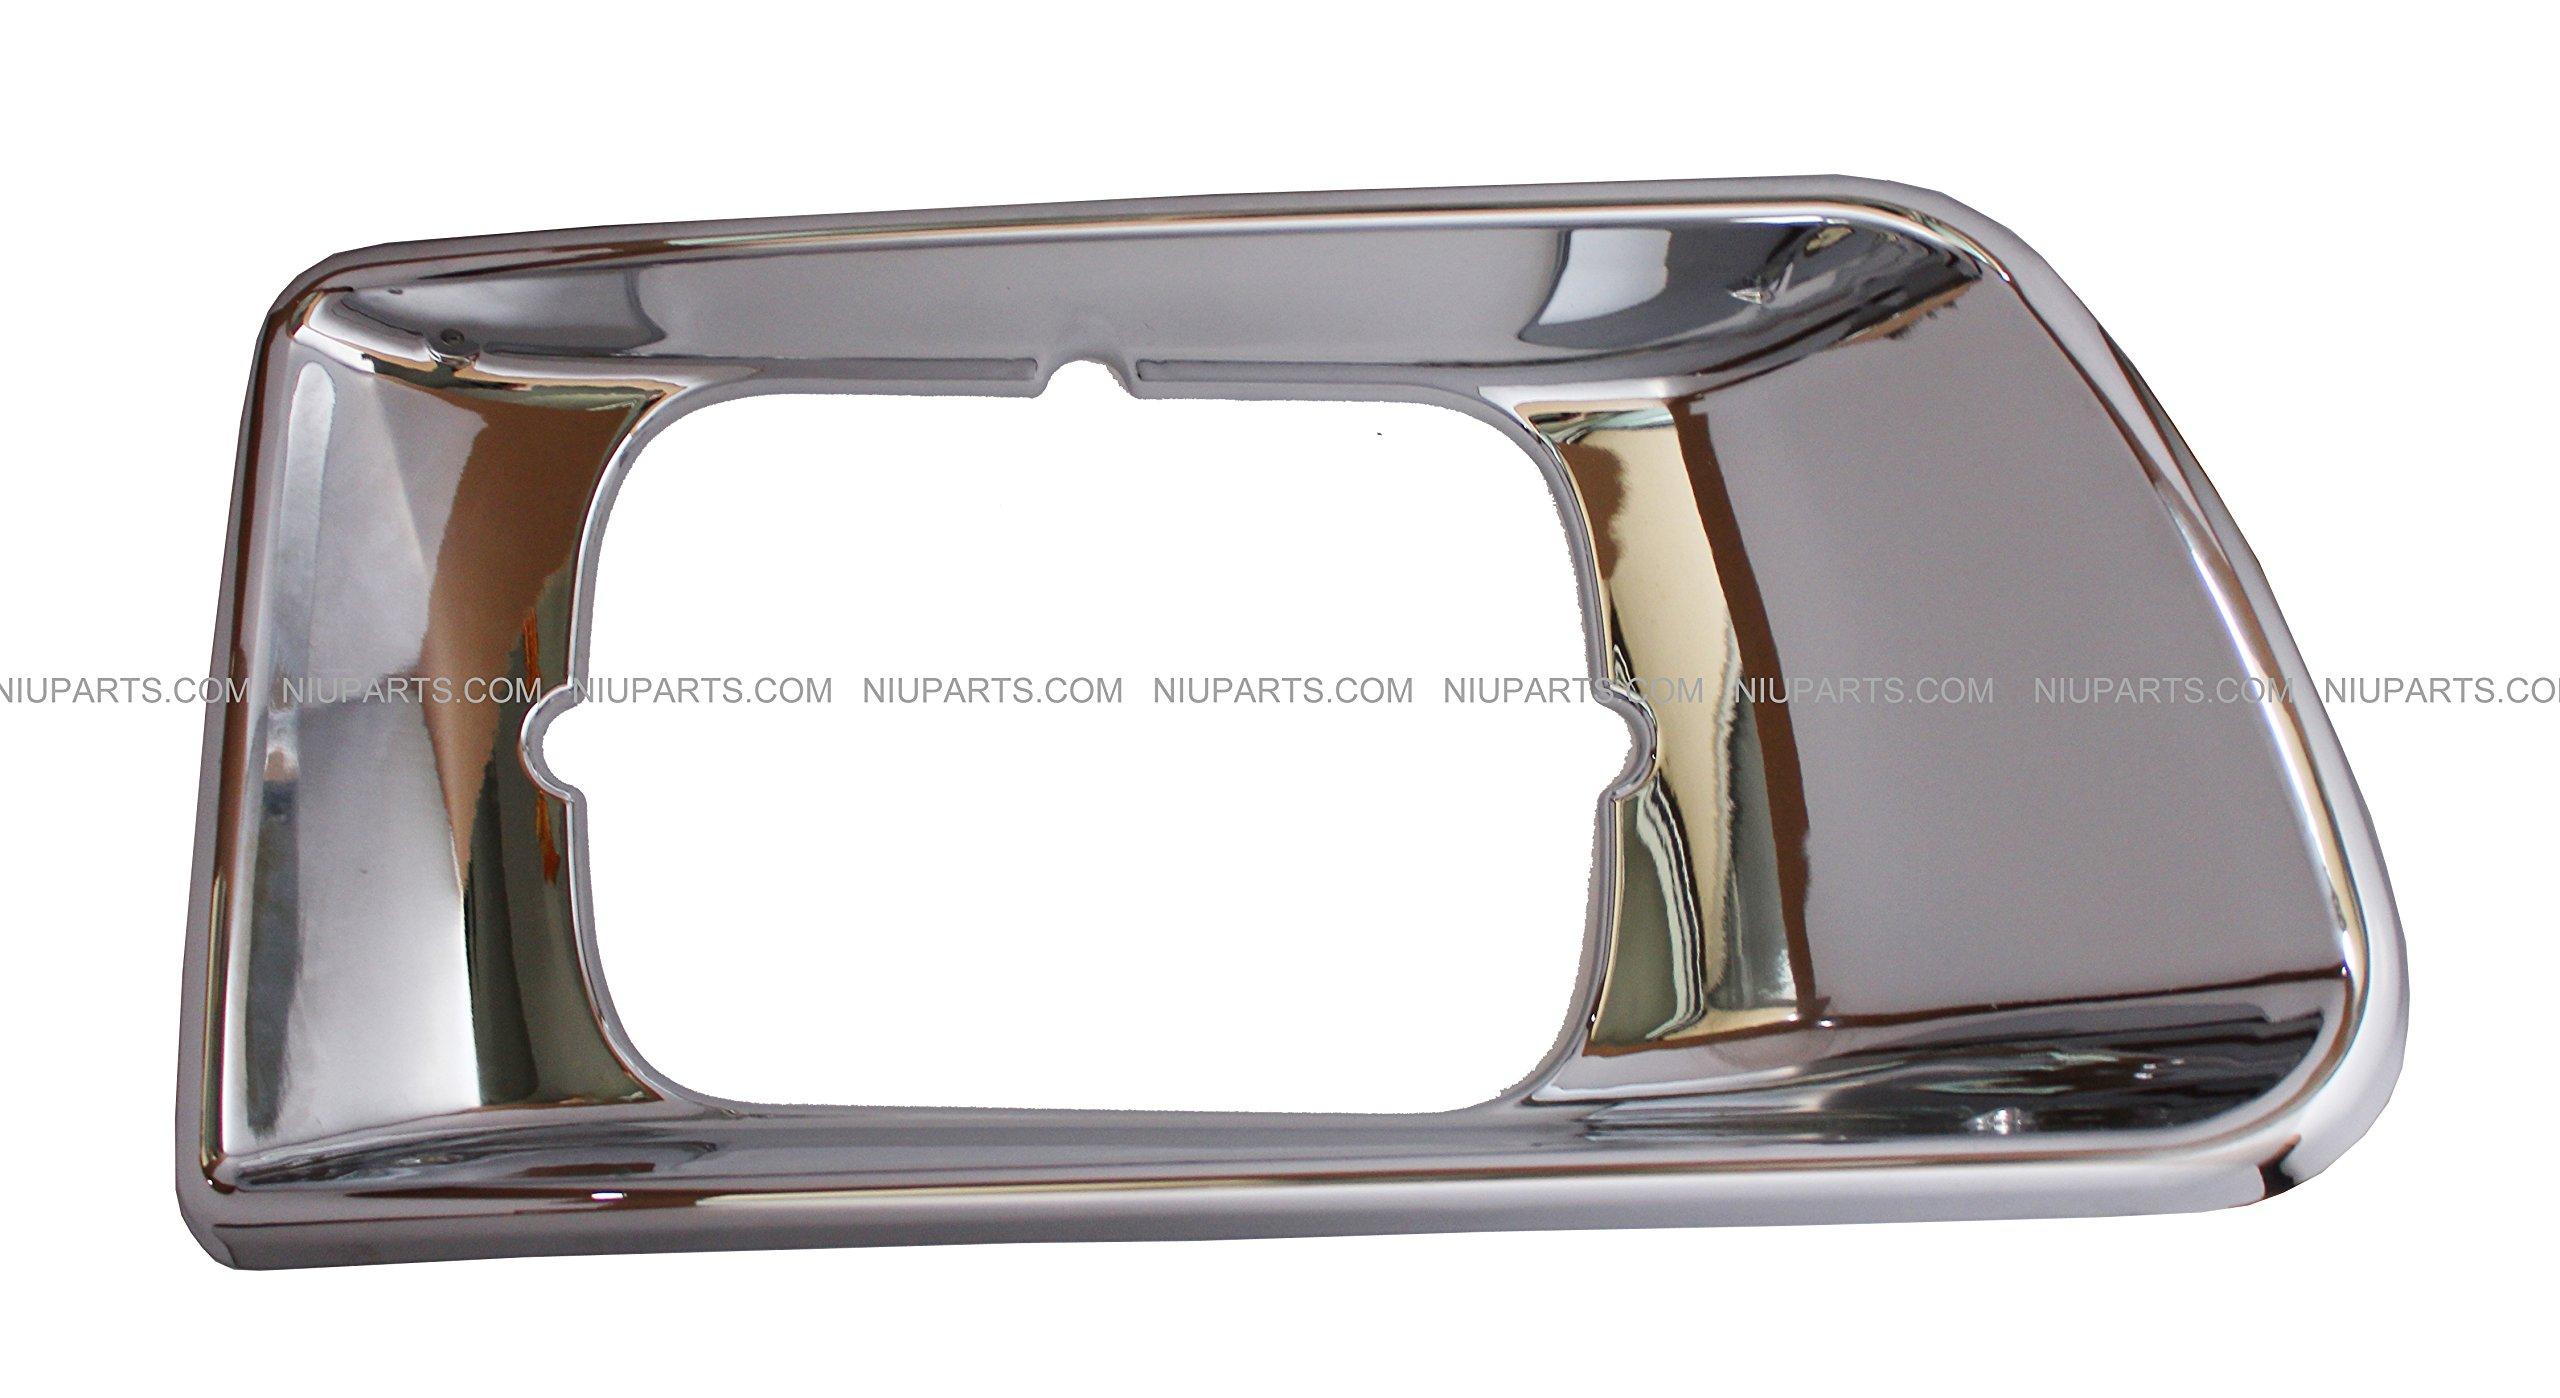 Headlight Bezel Chrome - Passenger Side (Fit; Kenworth T300 T330) by NIUPARTS